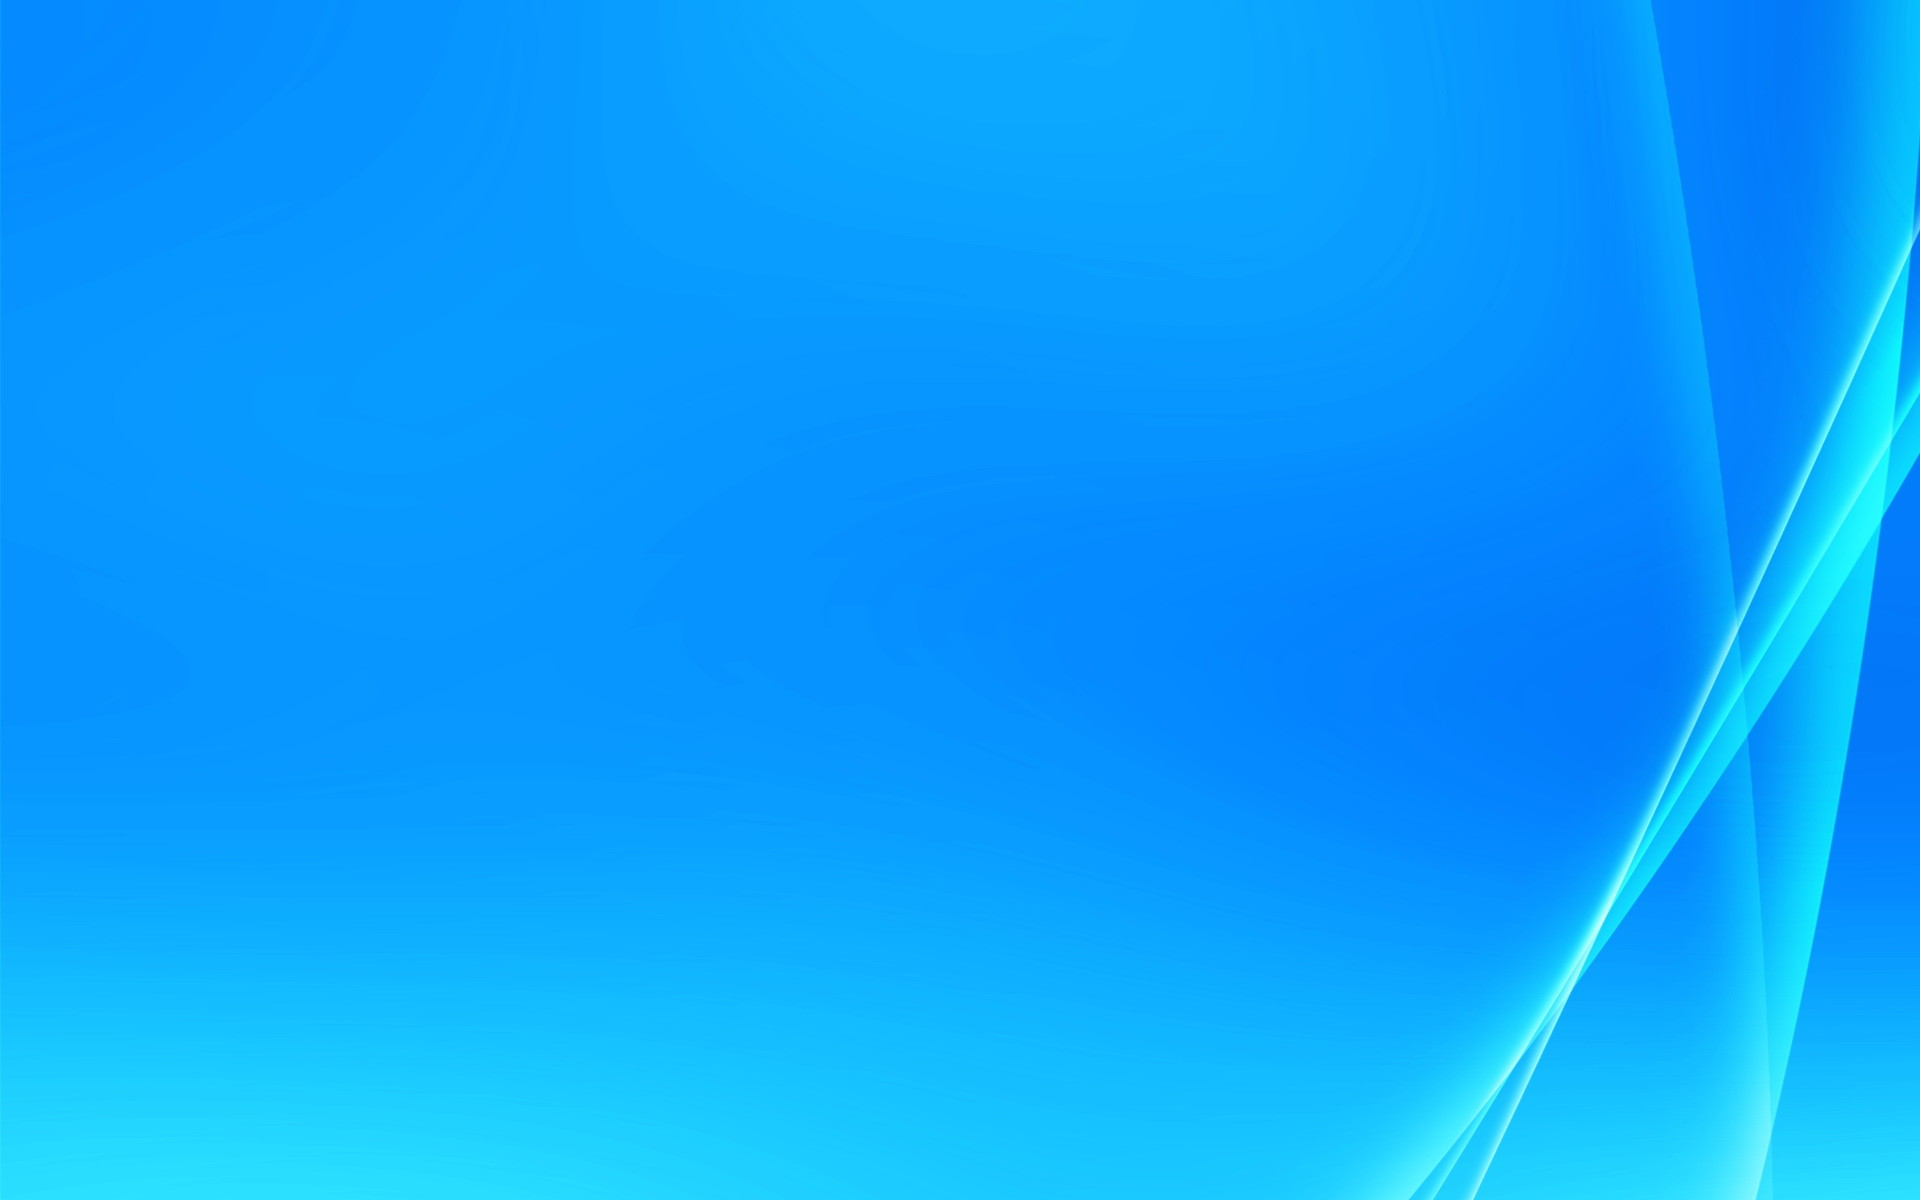 Plain Blue Colour Wallpaper Posted By Michelle Thompson